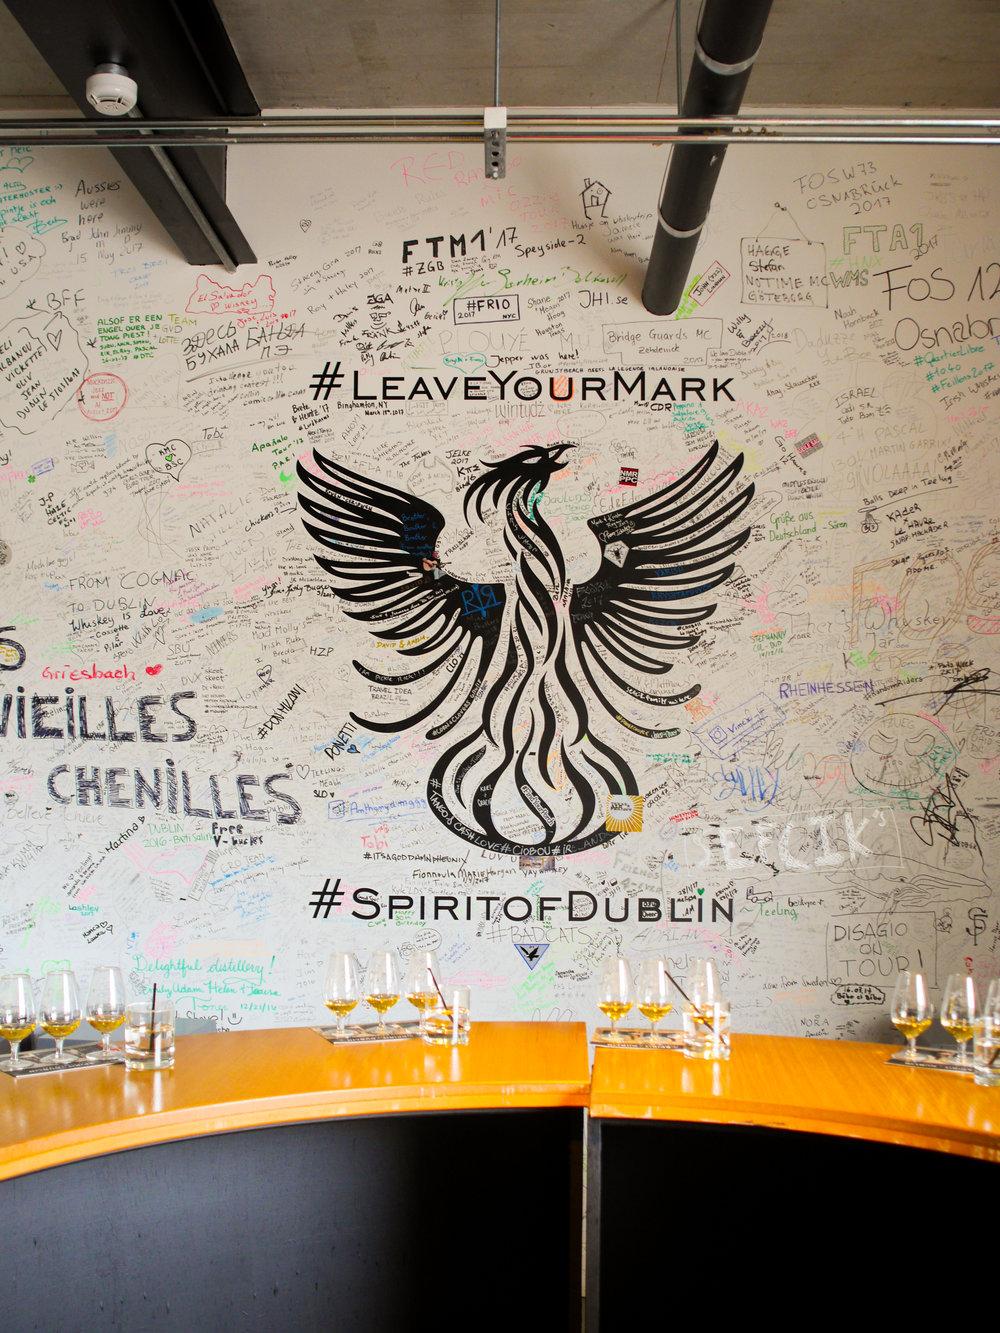 Tasting area Whiskey fermentation at Teeling Distillery in Dublin, Ireland